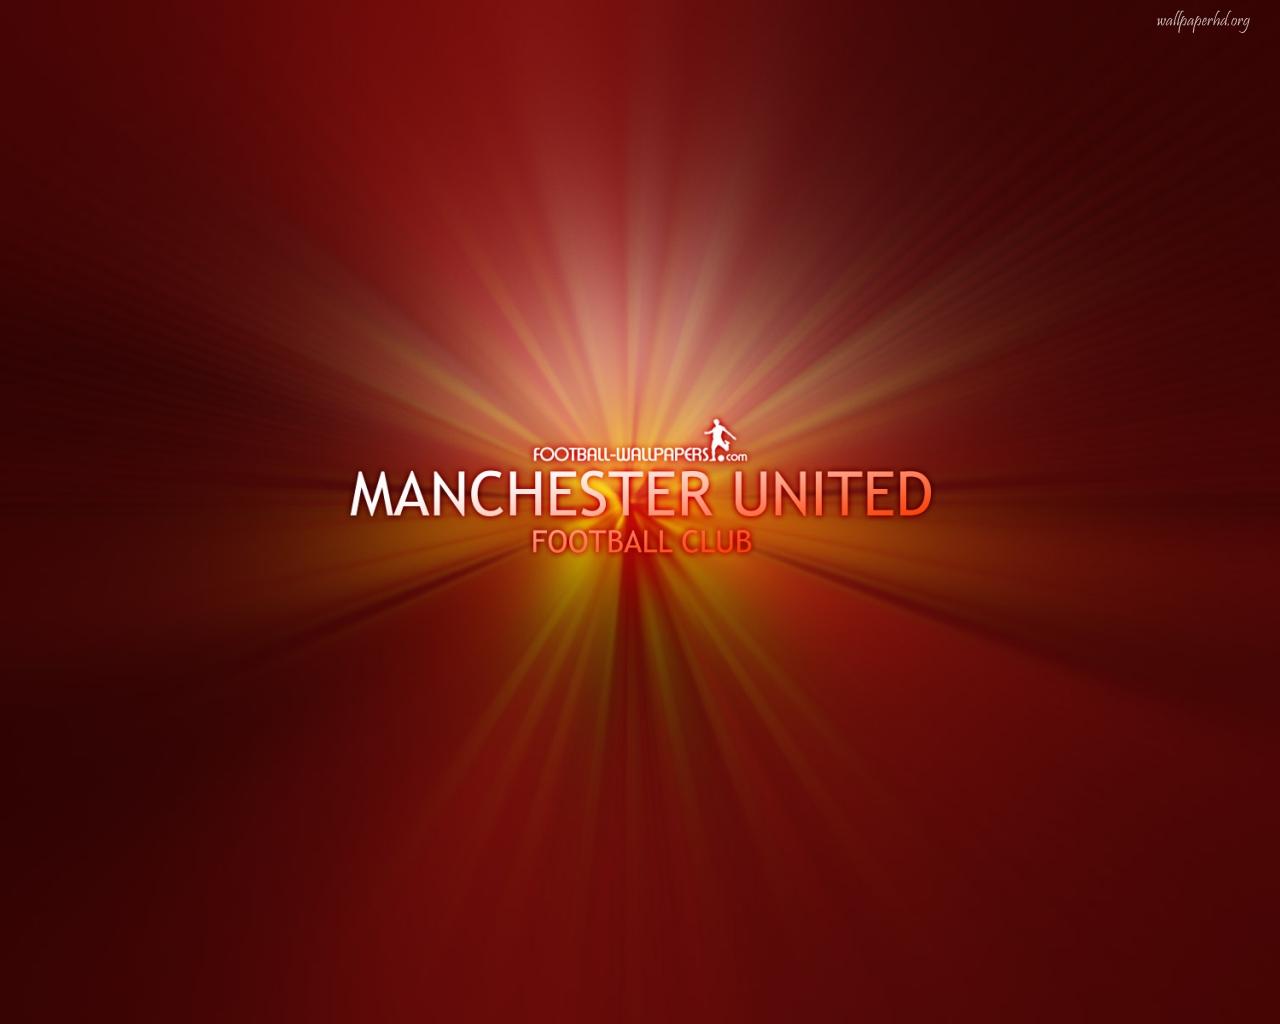 http://3.bp.blogspot.com/-orcNzyfteDk/Tc5KYrC_5oI/AAAAAAAABfk/hd8RGcy1APE/s1600/manchester-united-football-club_1280x1024.jpg